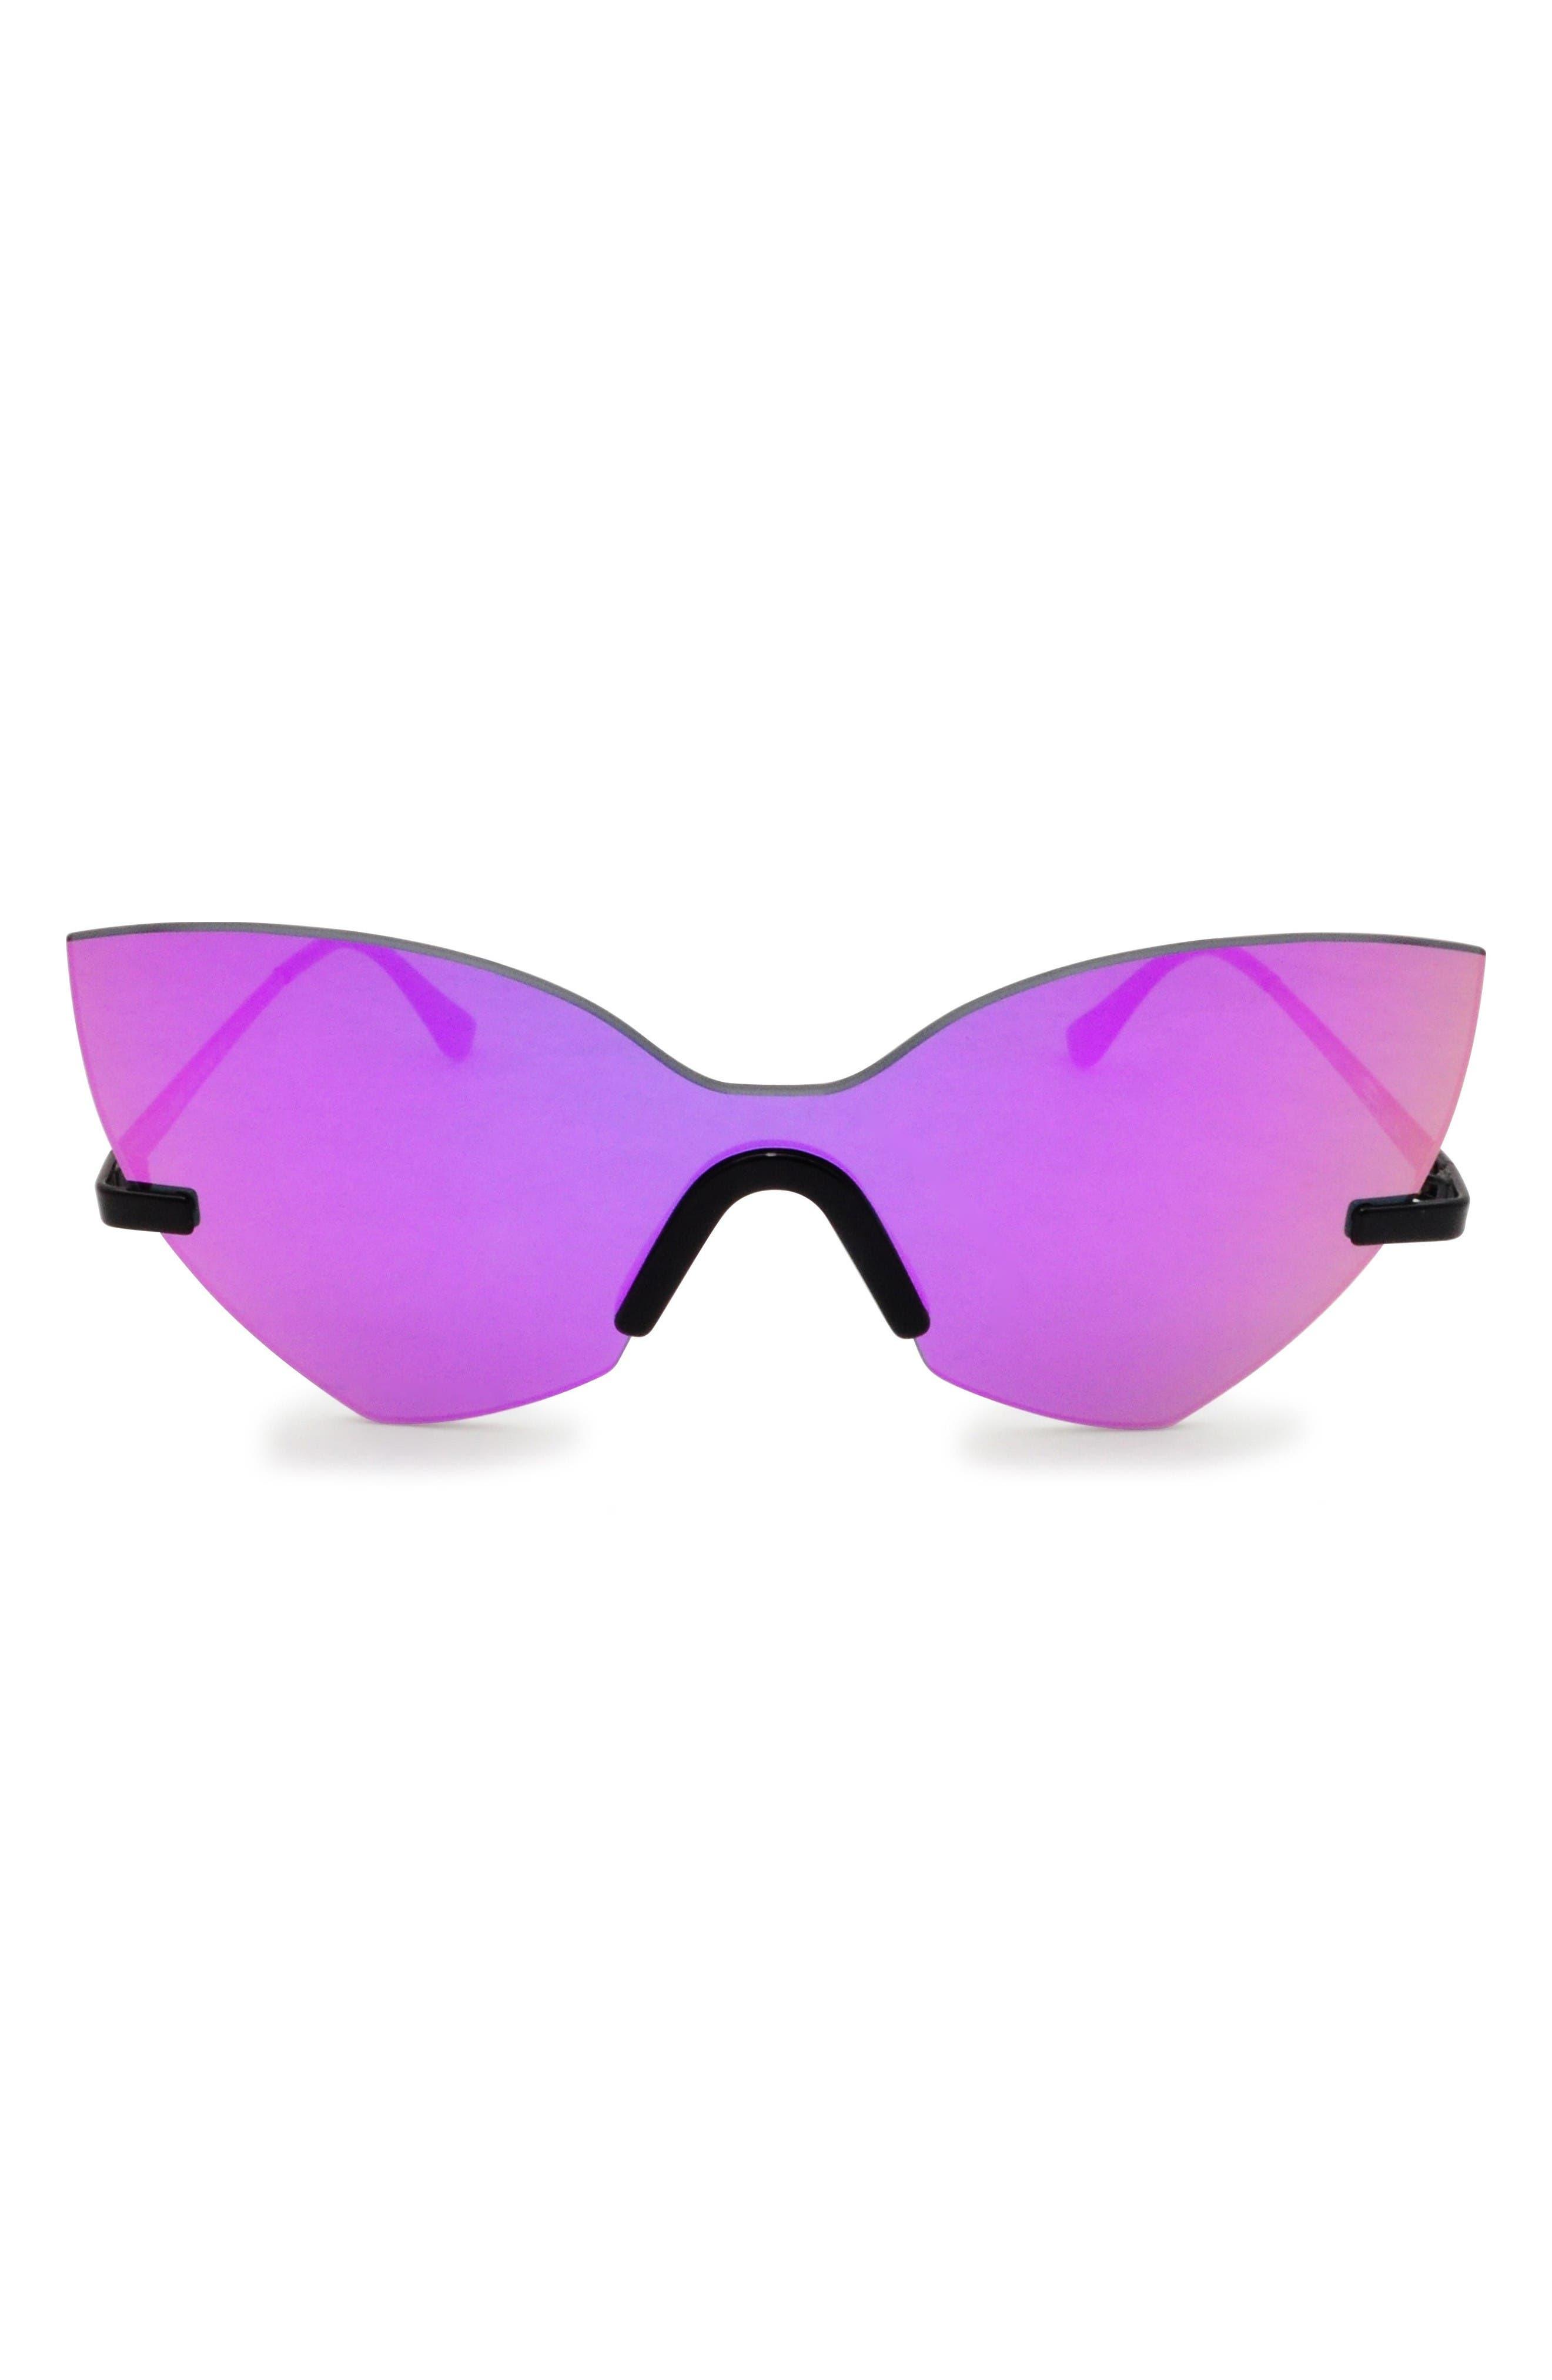 Main Image - GLASSING 55mm Cat Eye Shield Sunglasses